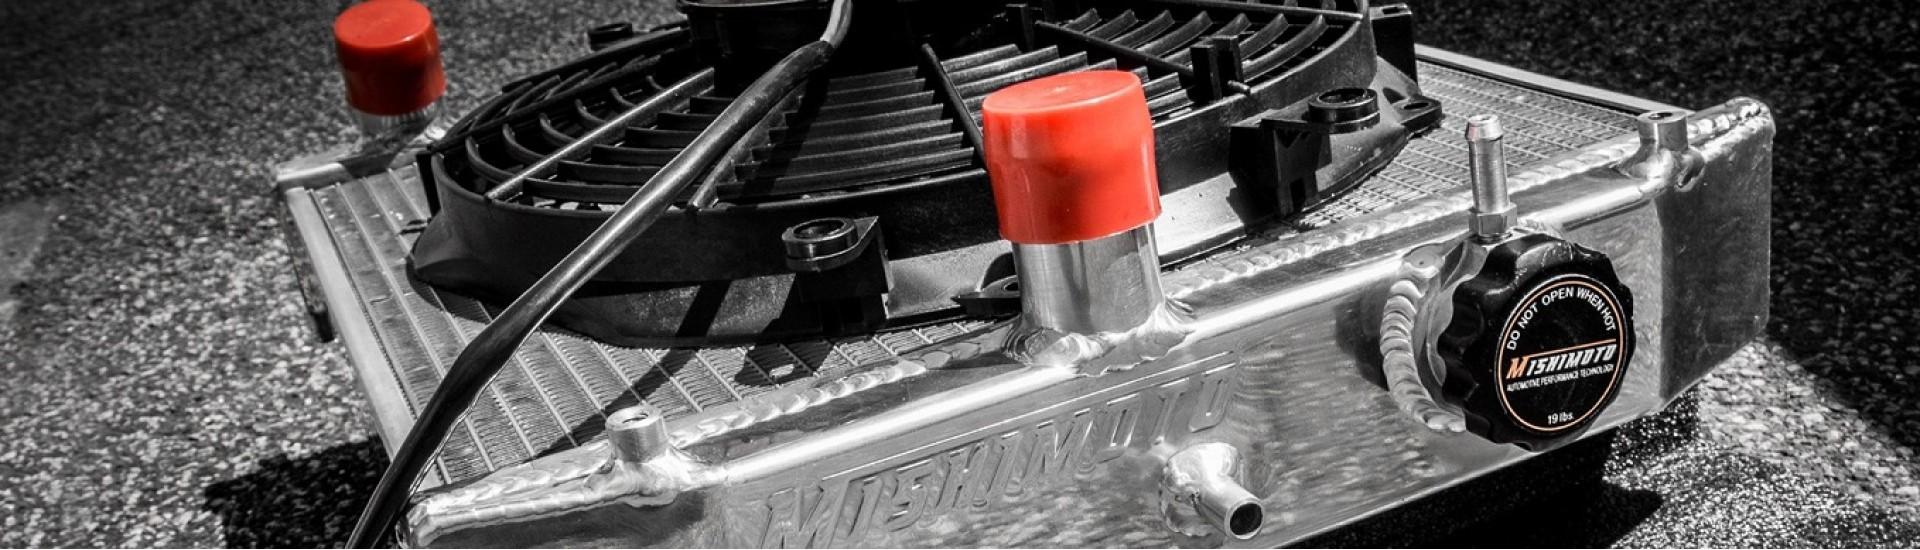 سیستم خنک کننده موتور ، performance engine cooling